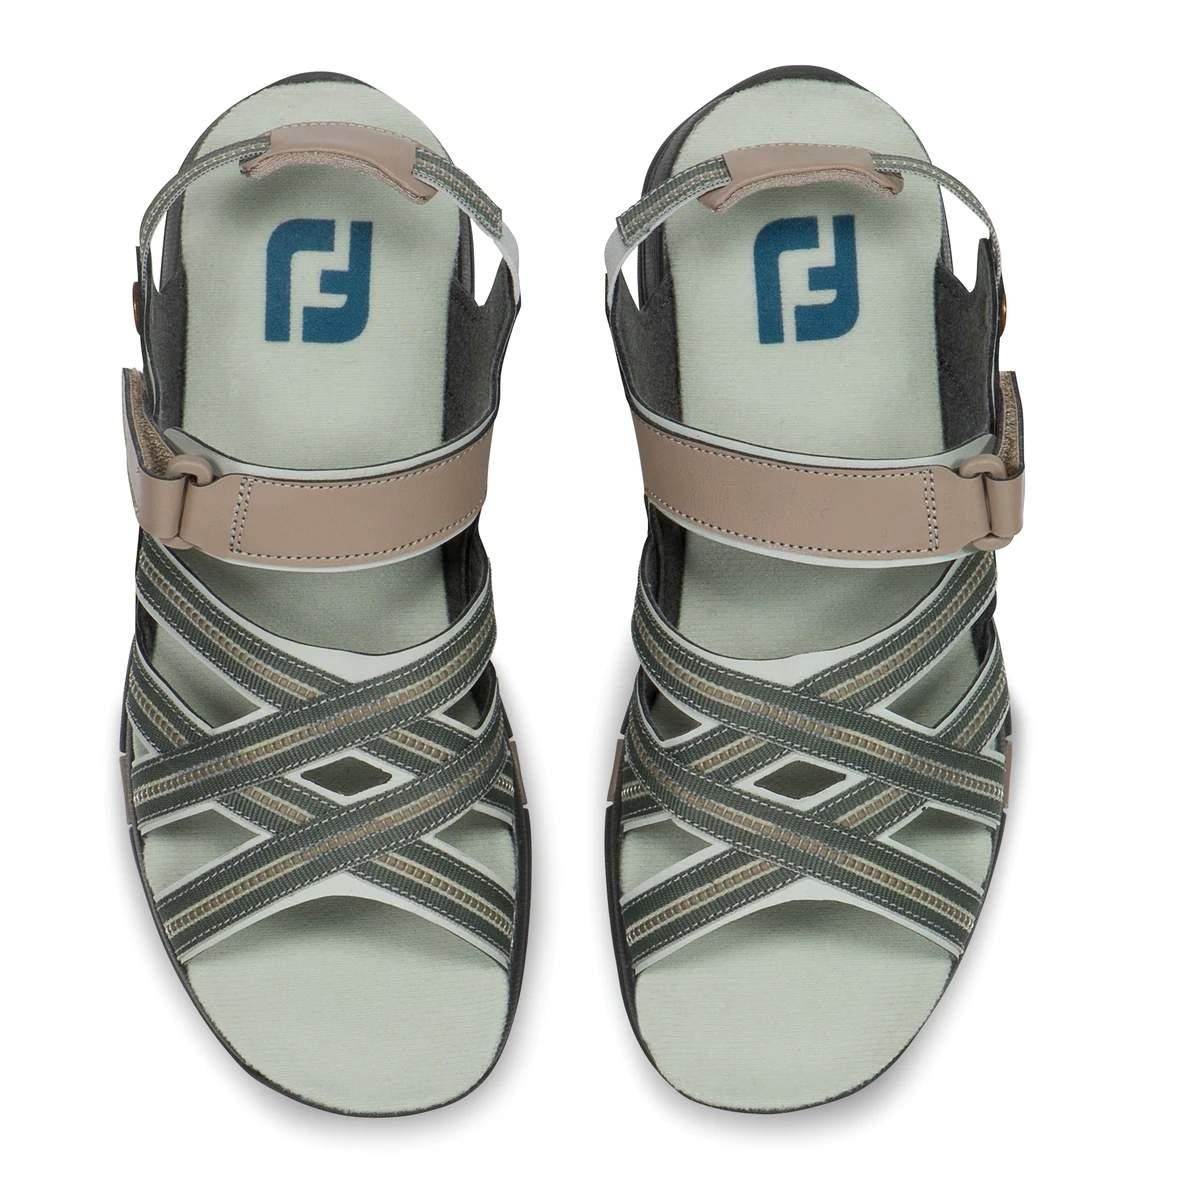 FootJoy Women's Golf Sandal - Style 48446